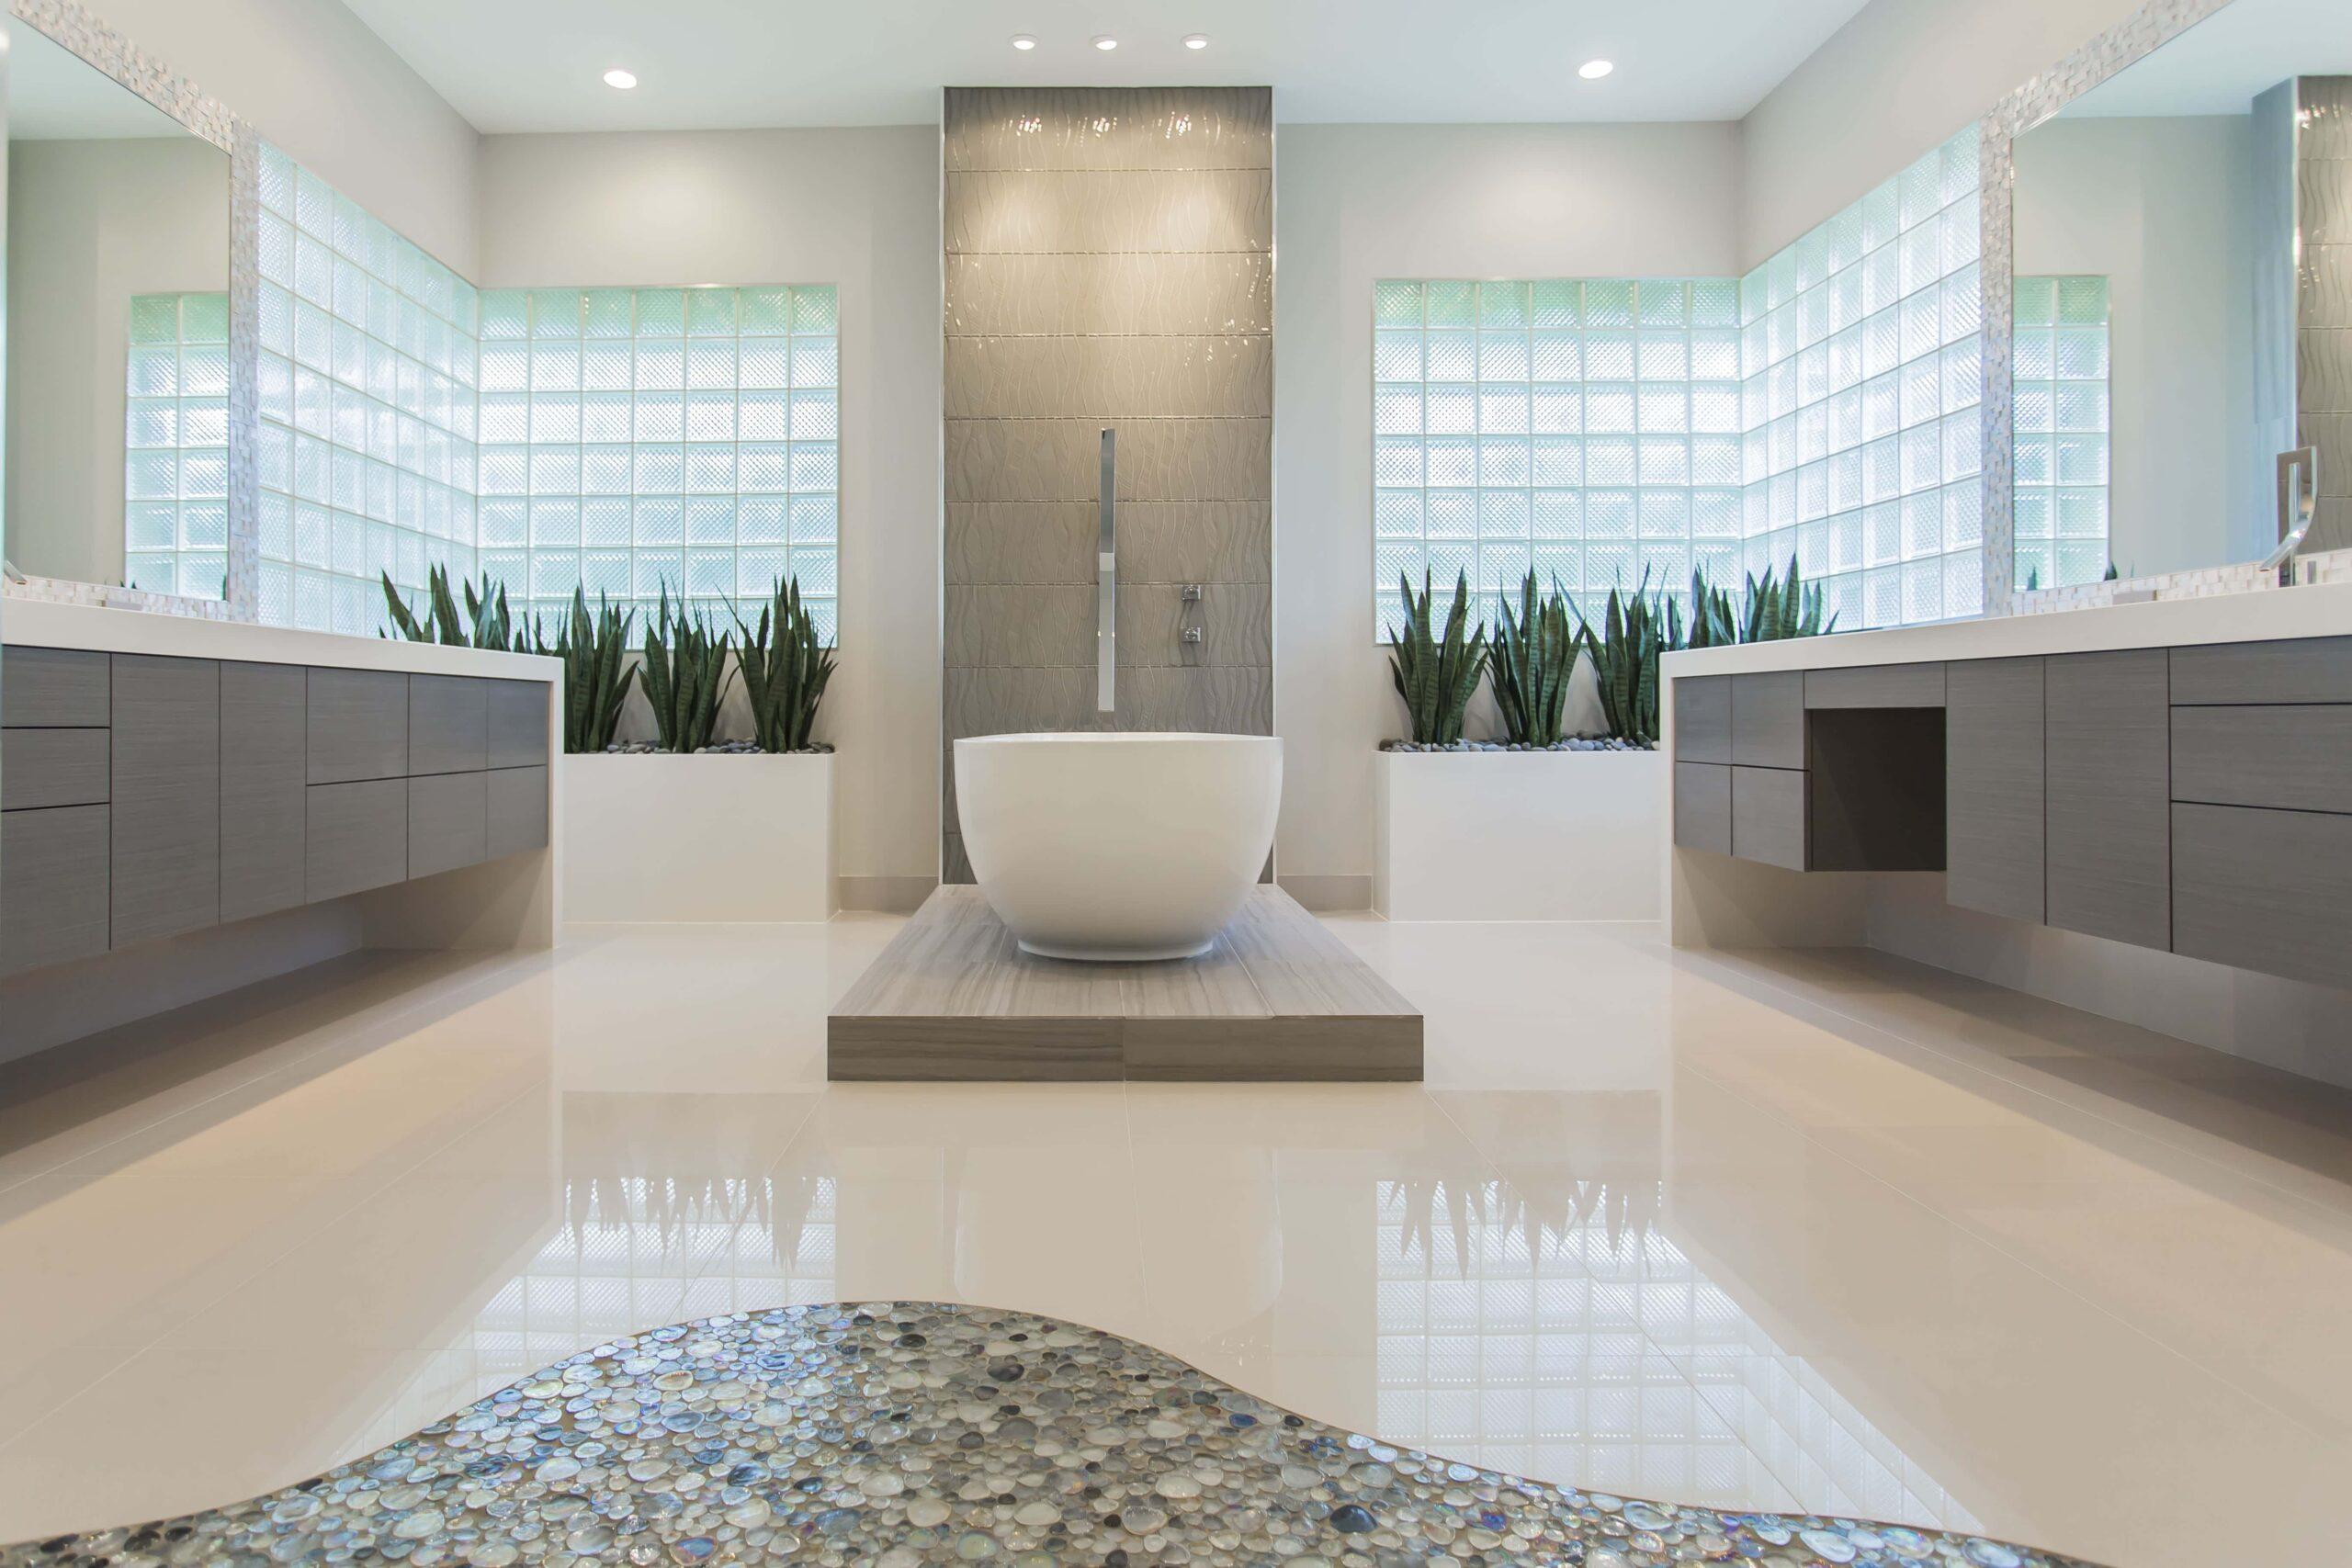 Memorial Modern Master Bath Remodel   Houston, TX   2015